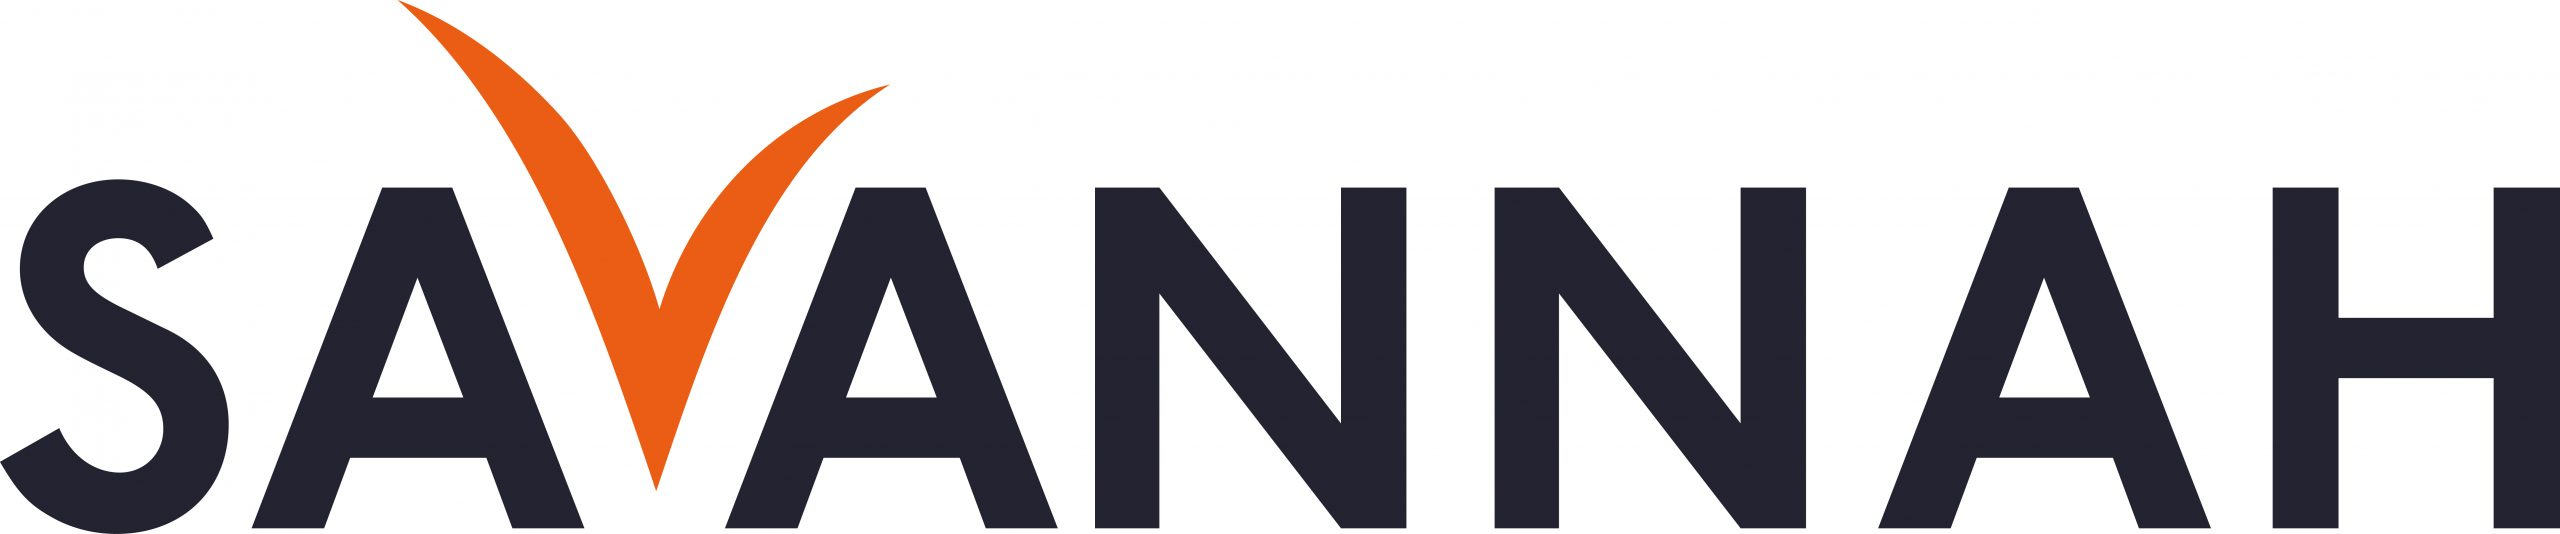 Savannah Logo High Res